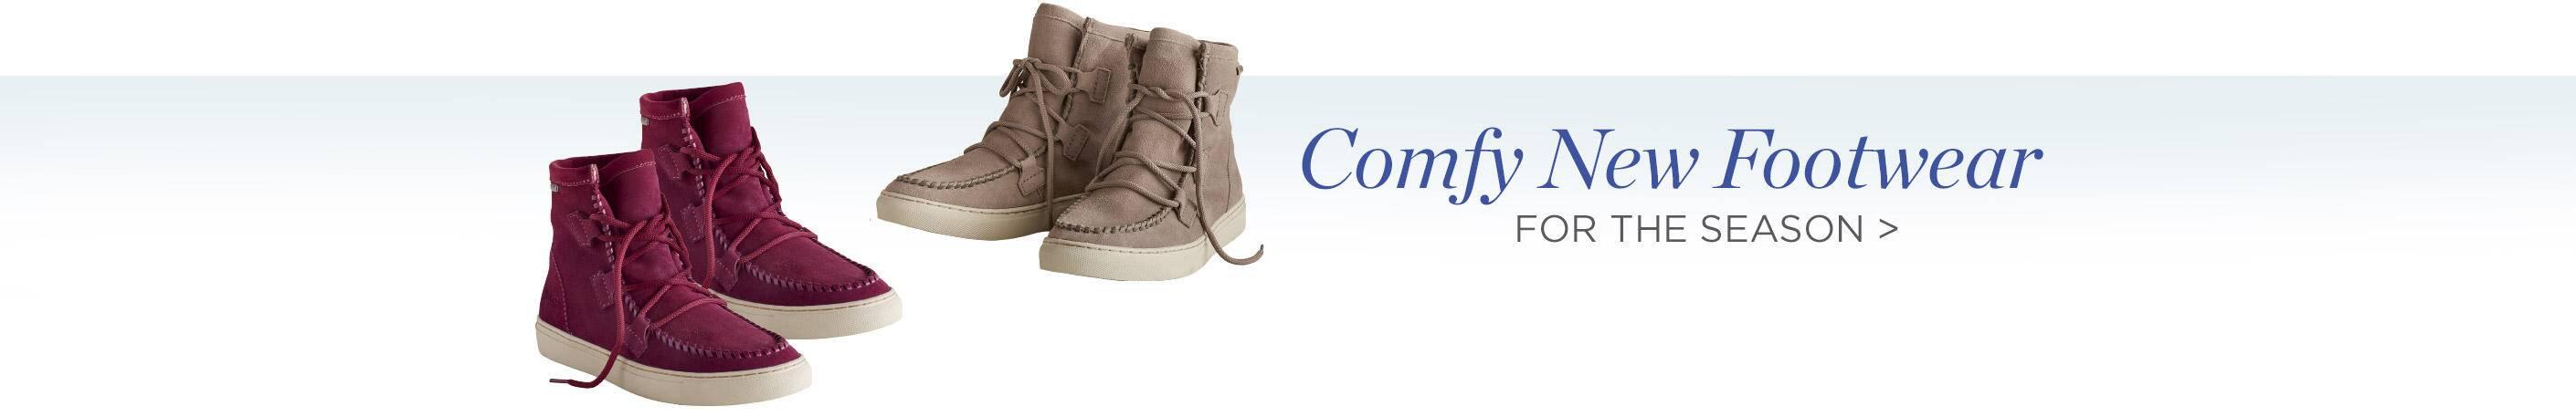 Comfy New Footwear